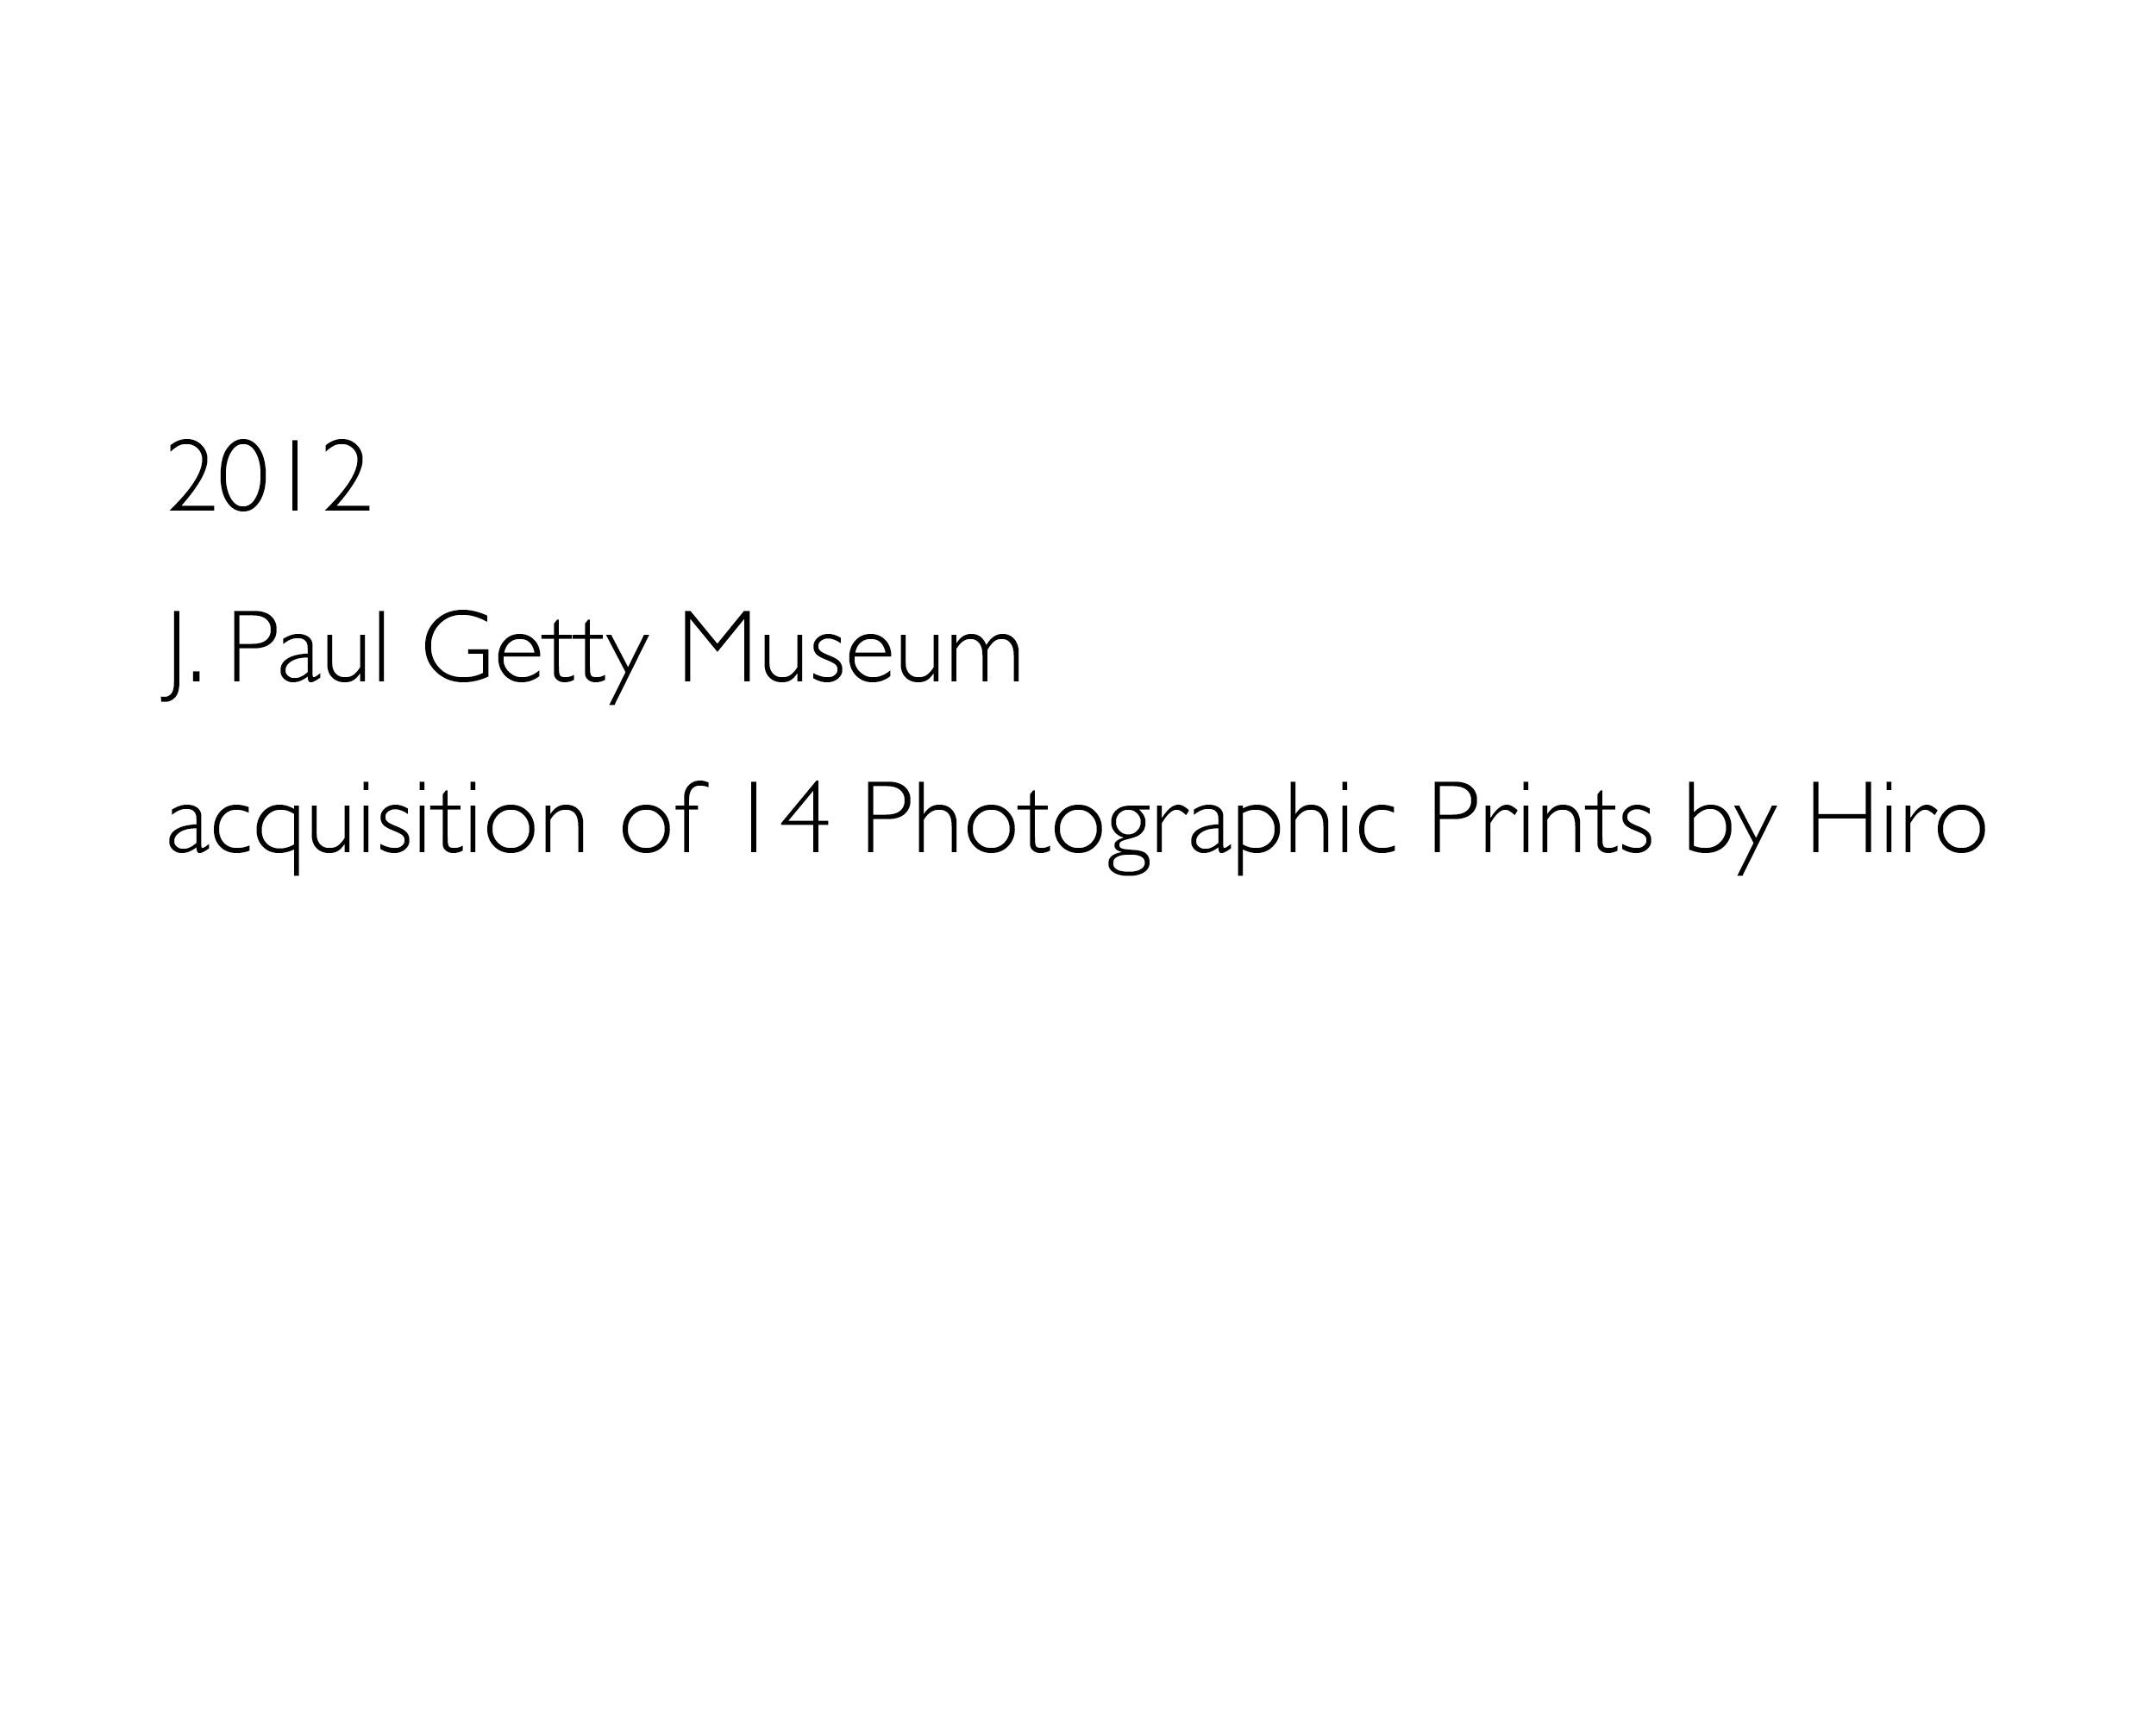 HIRO, J. Paul Getty Museum Print Acquisition, 2012